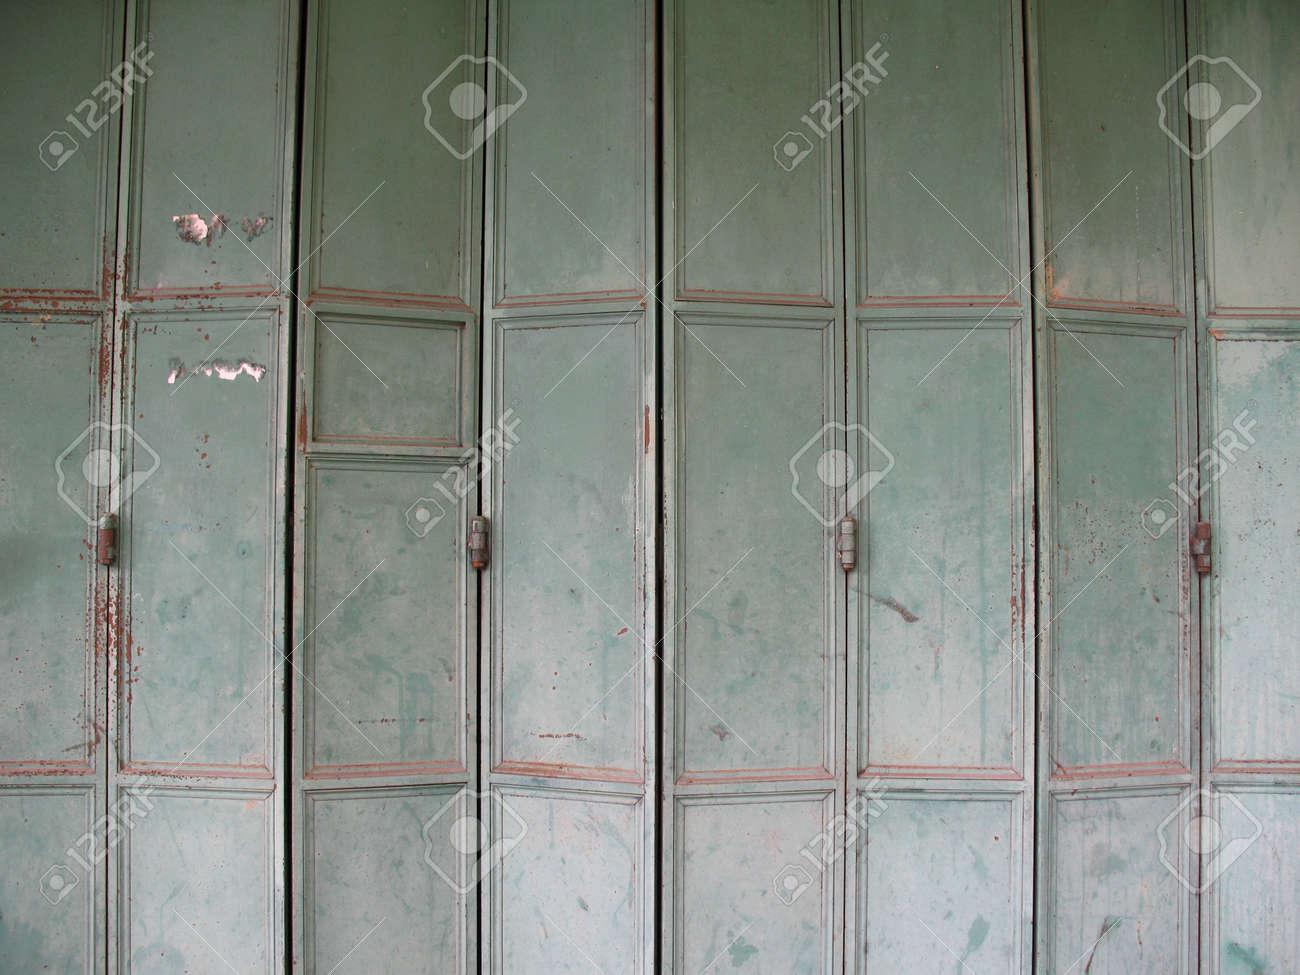 Amazing Folding Metal Doors Images - Exterior ideas 3D - gaml.us ...